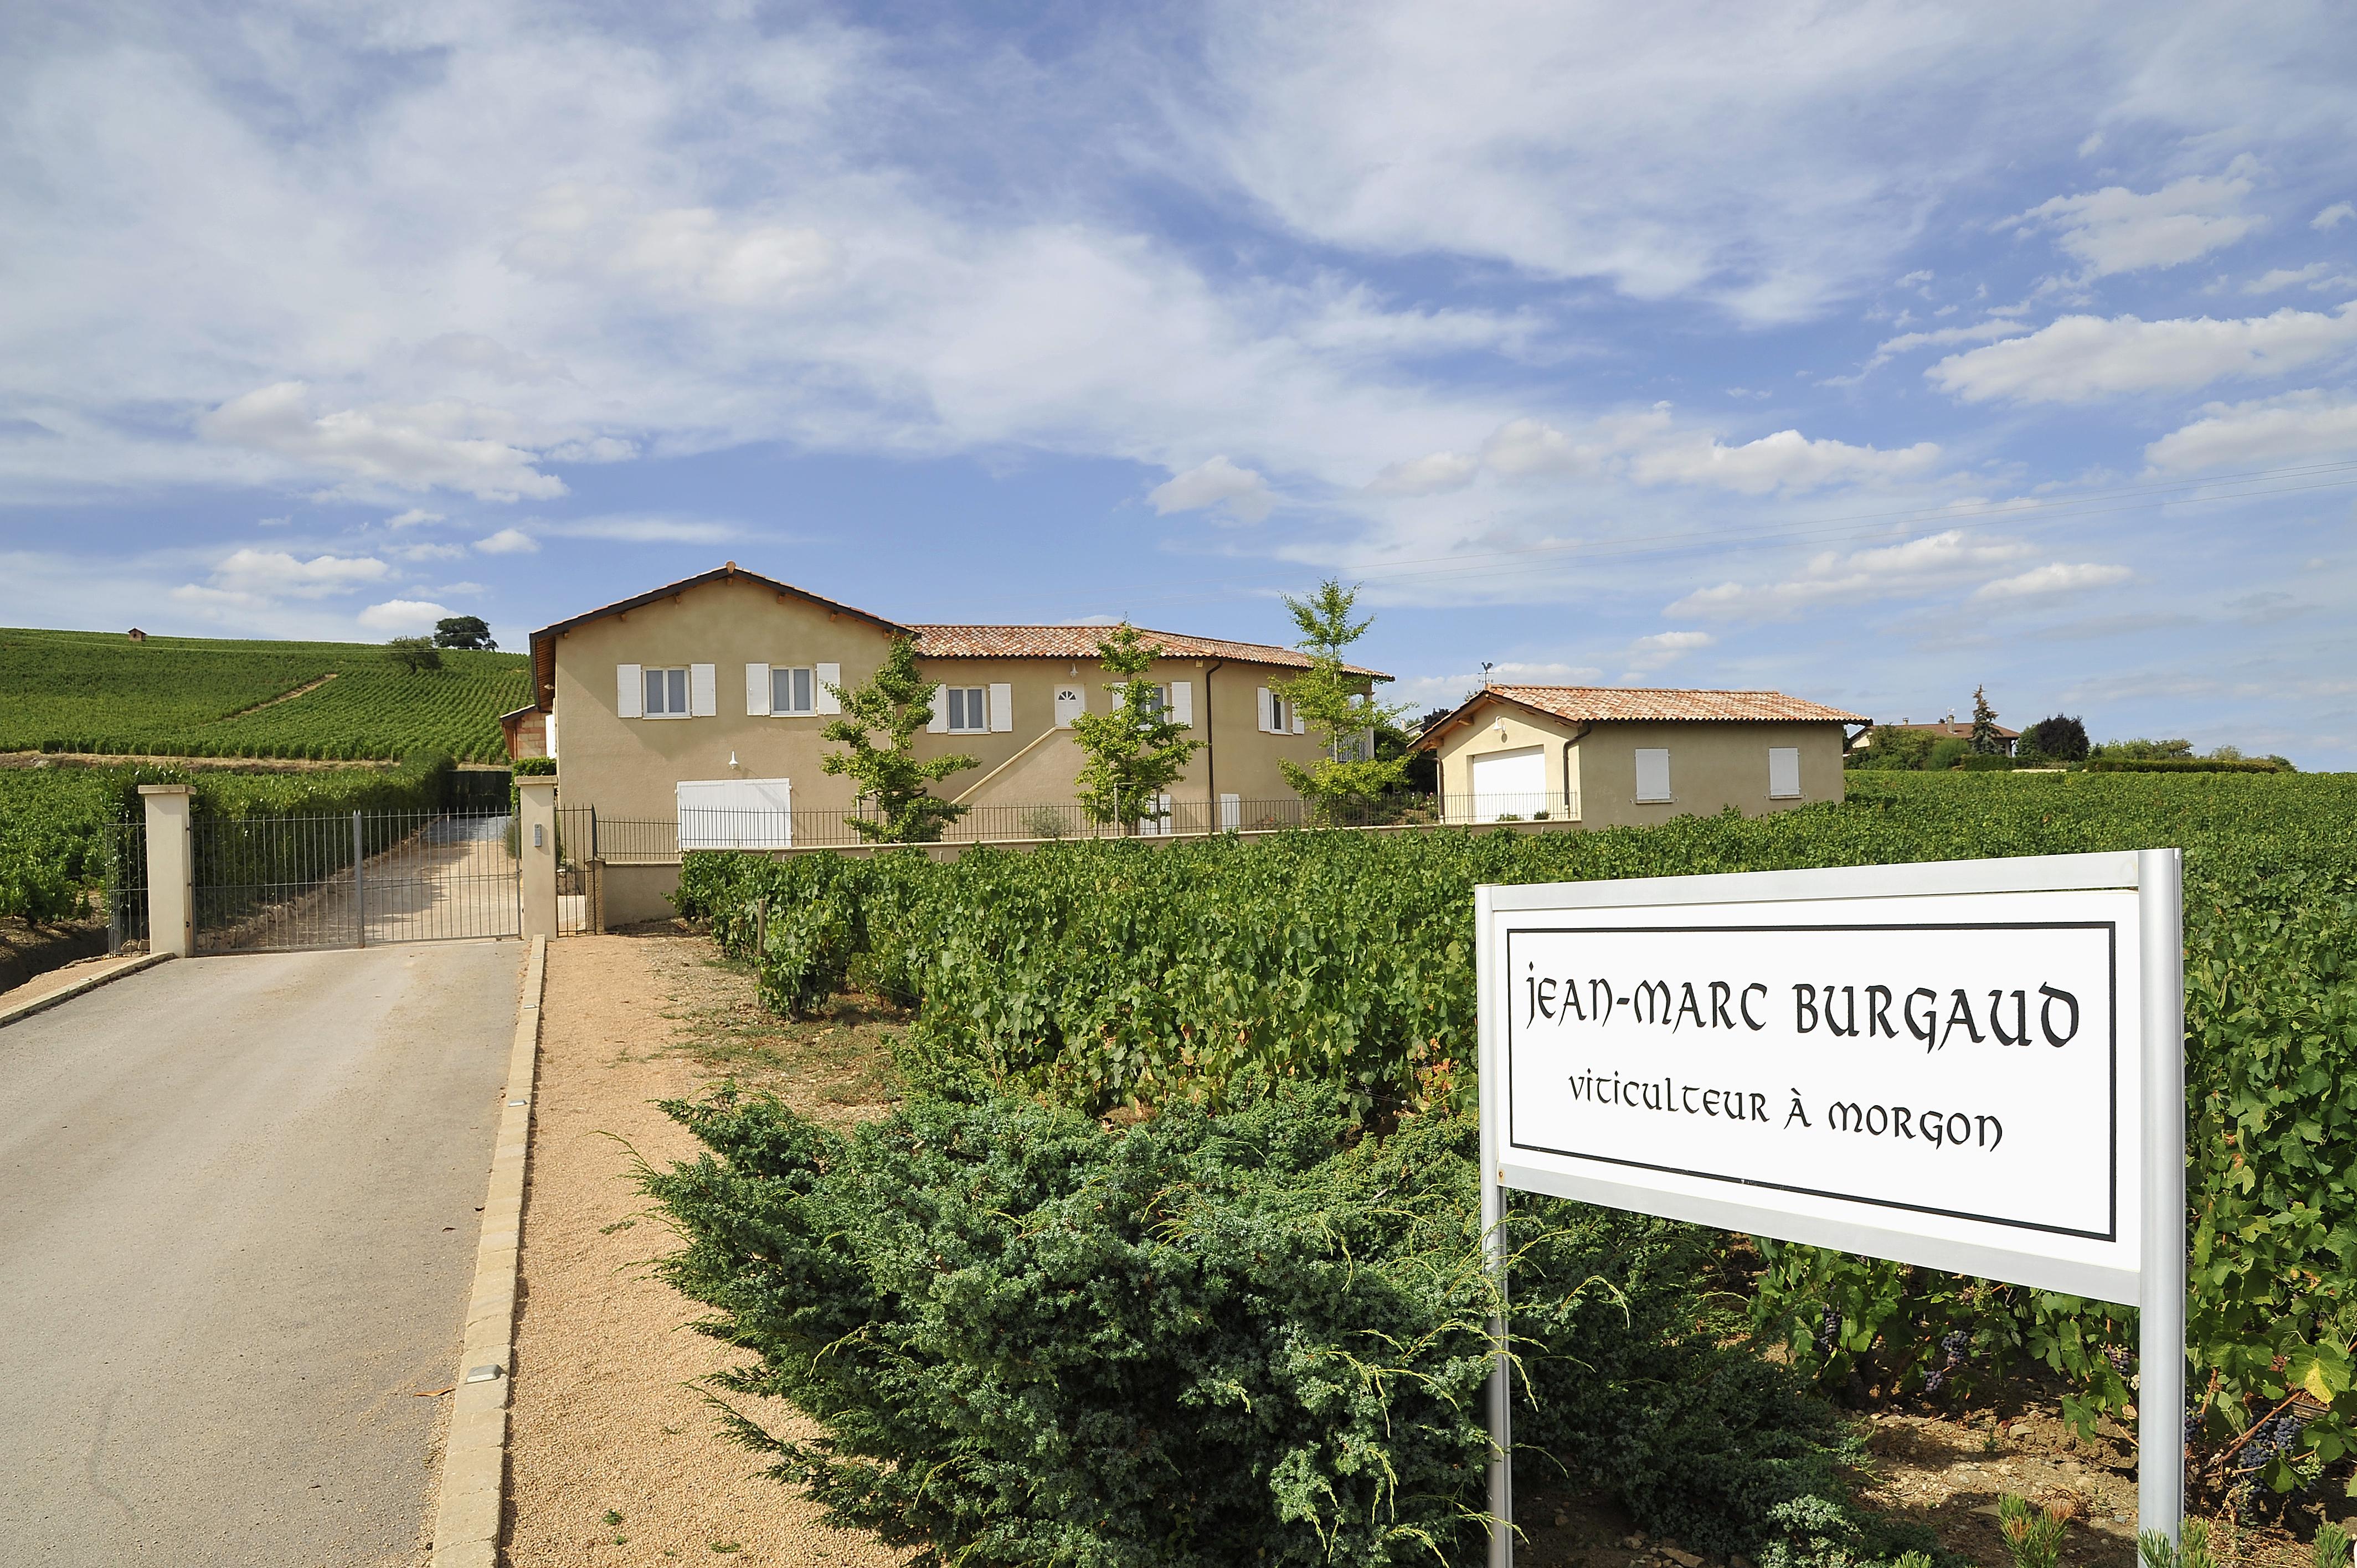 Jean Marc Burgaud Morgon Les Charmes 2017 Wine Com